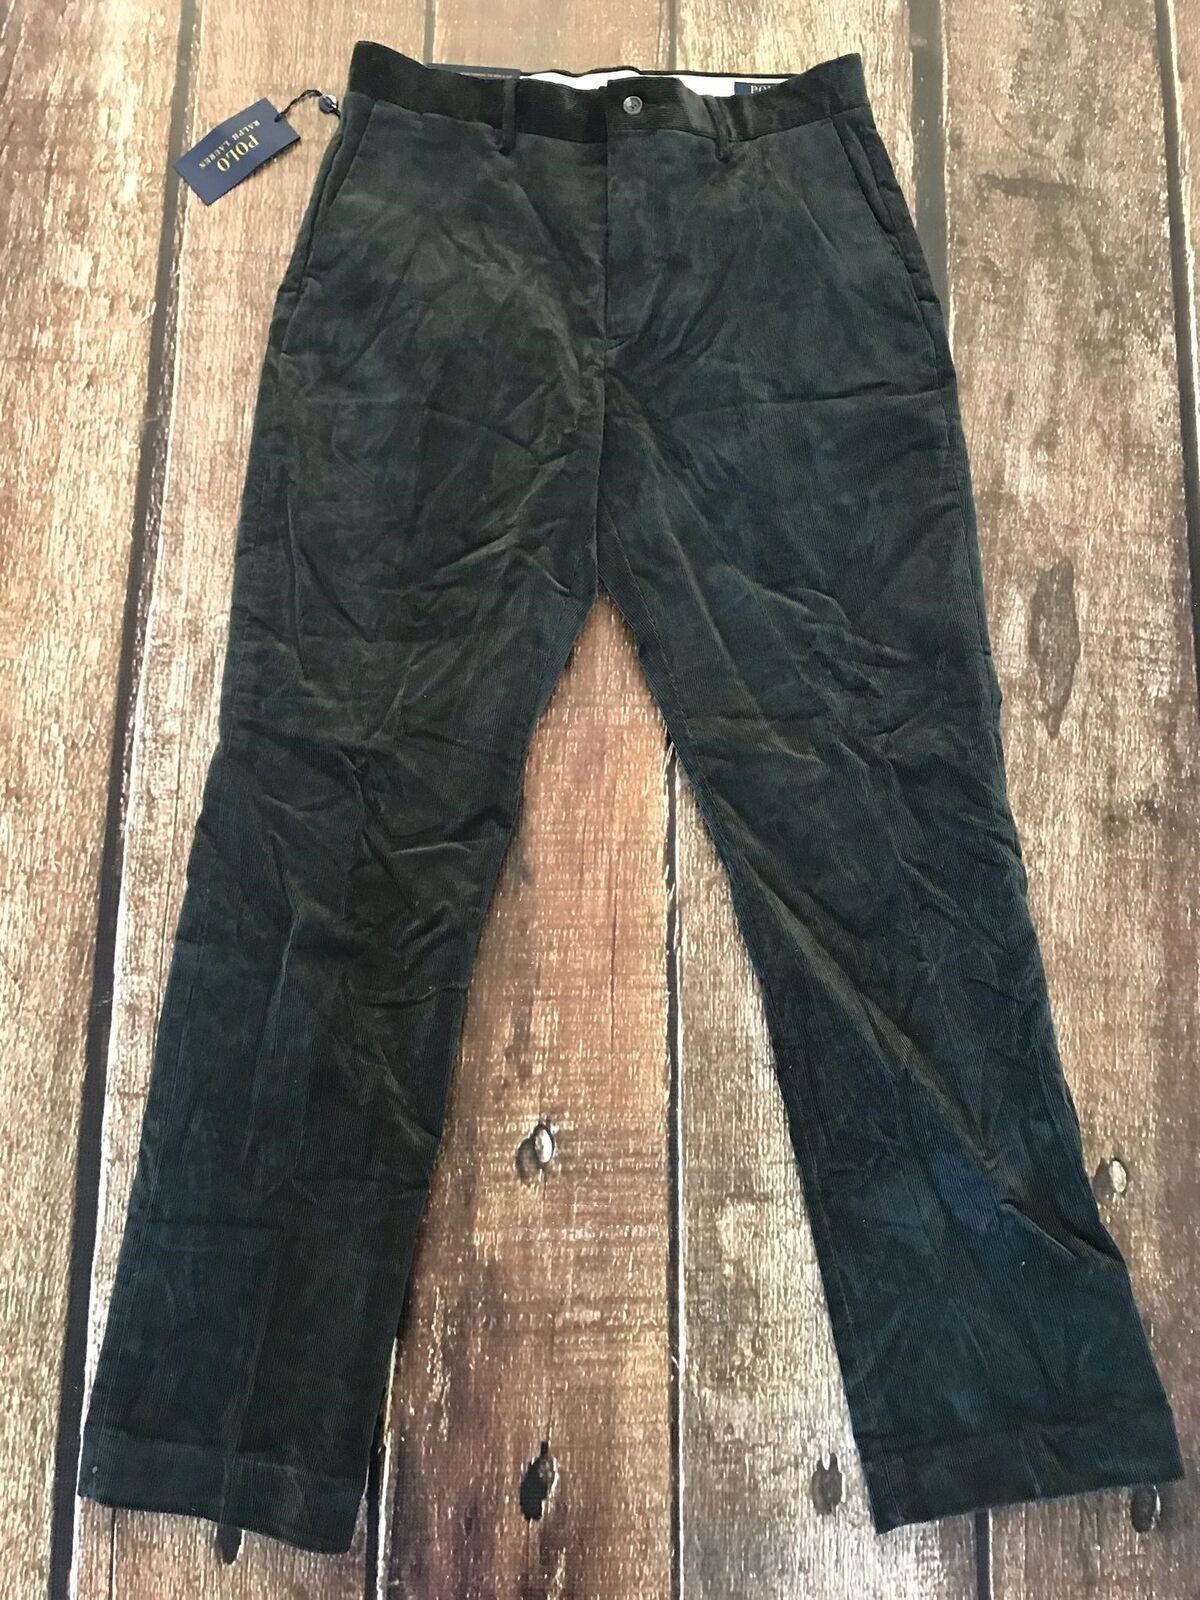 Polo Ralph Lauren Stretch Classic Fit Corduroy Pants Casper Green Mens 32x32 New